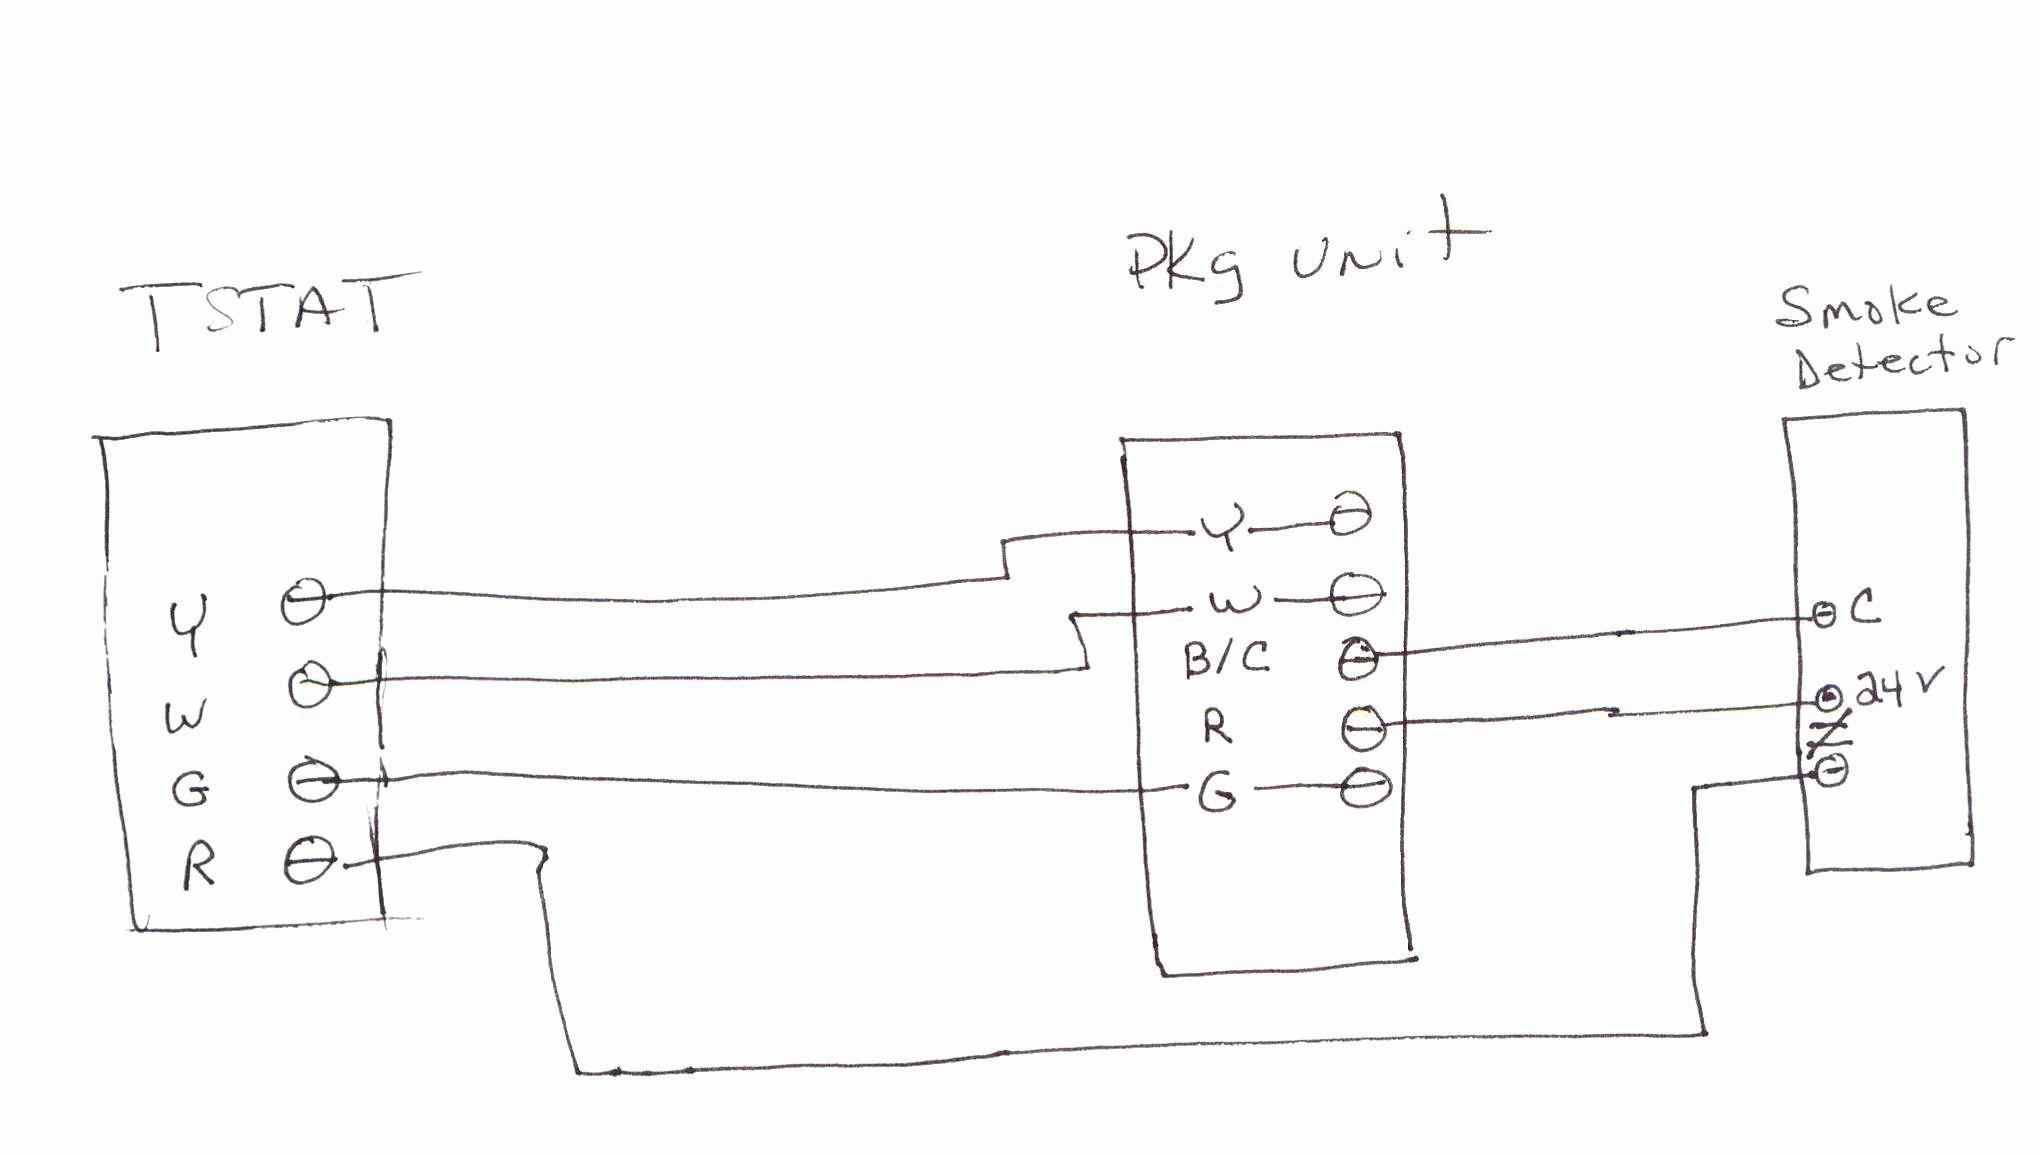 Simplex Duct Detector 2098 Wiring Diagram